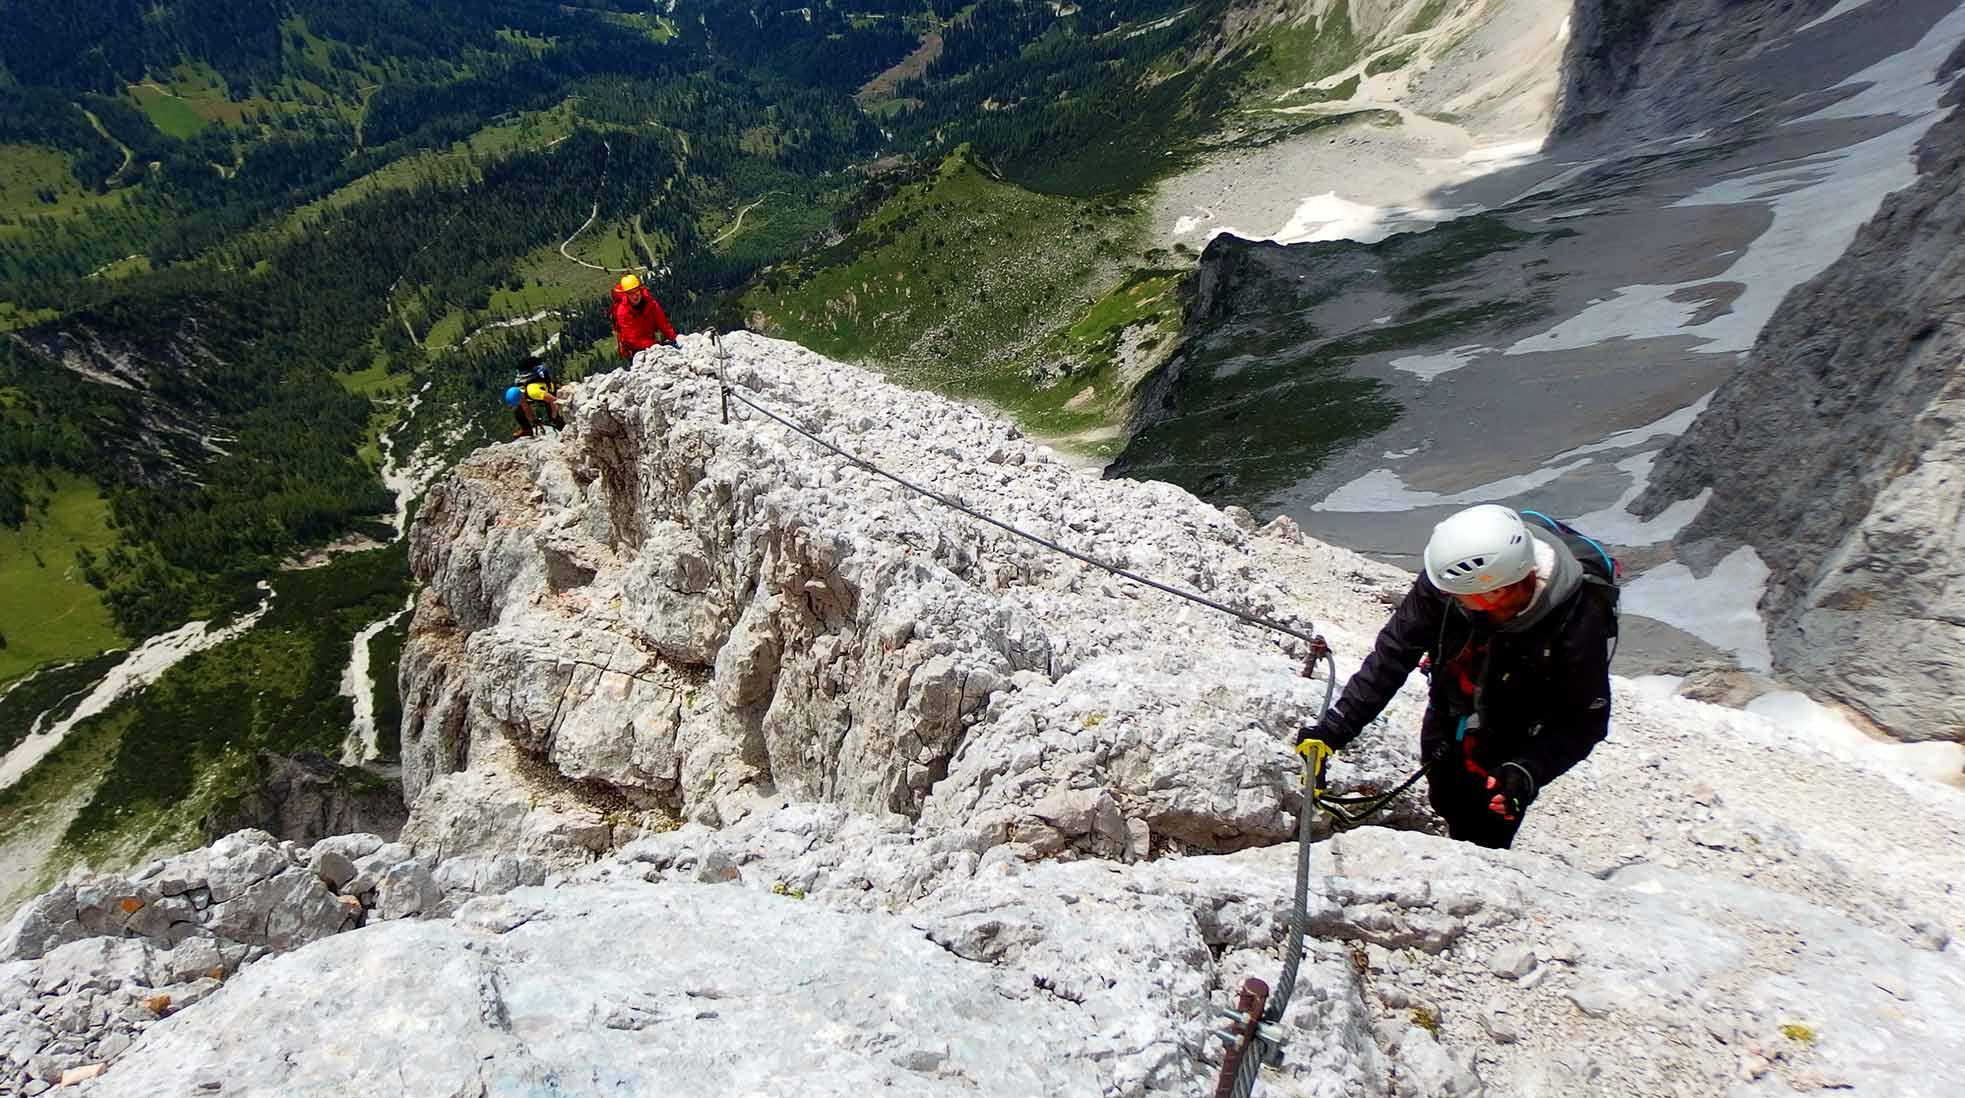 Three people climbing up a high mountain on a Via Ferrata